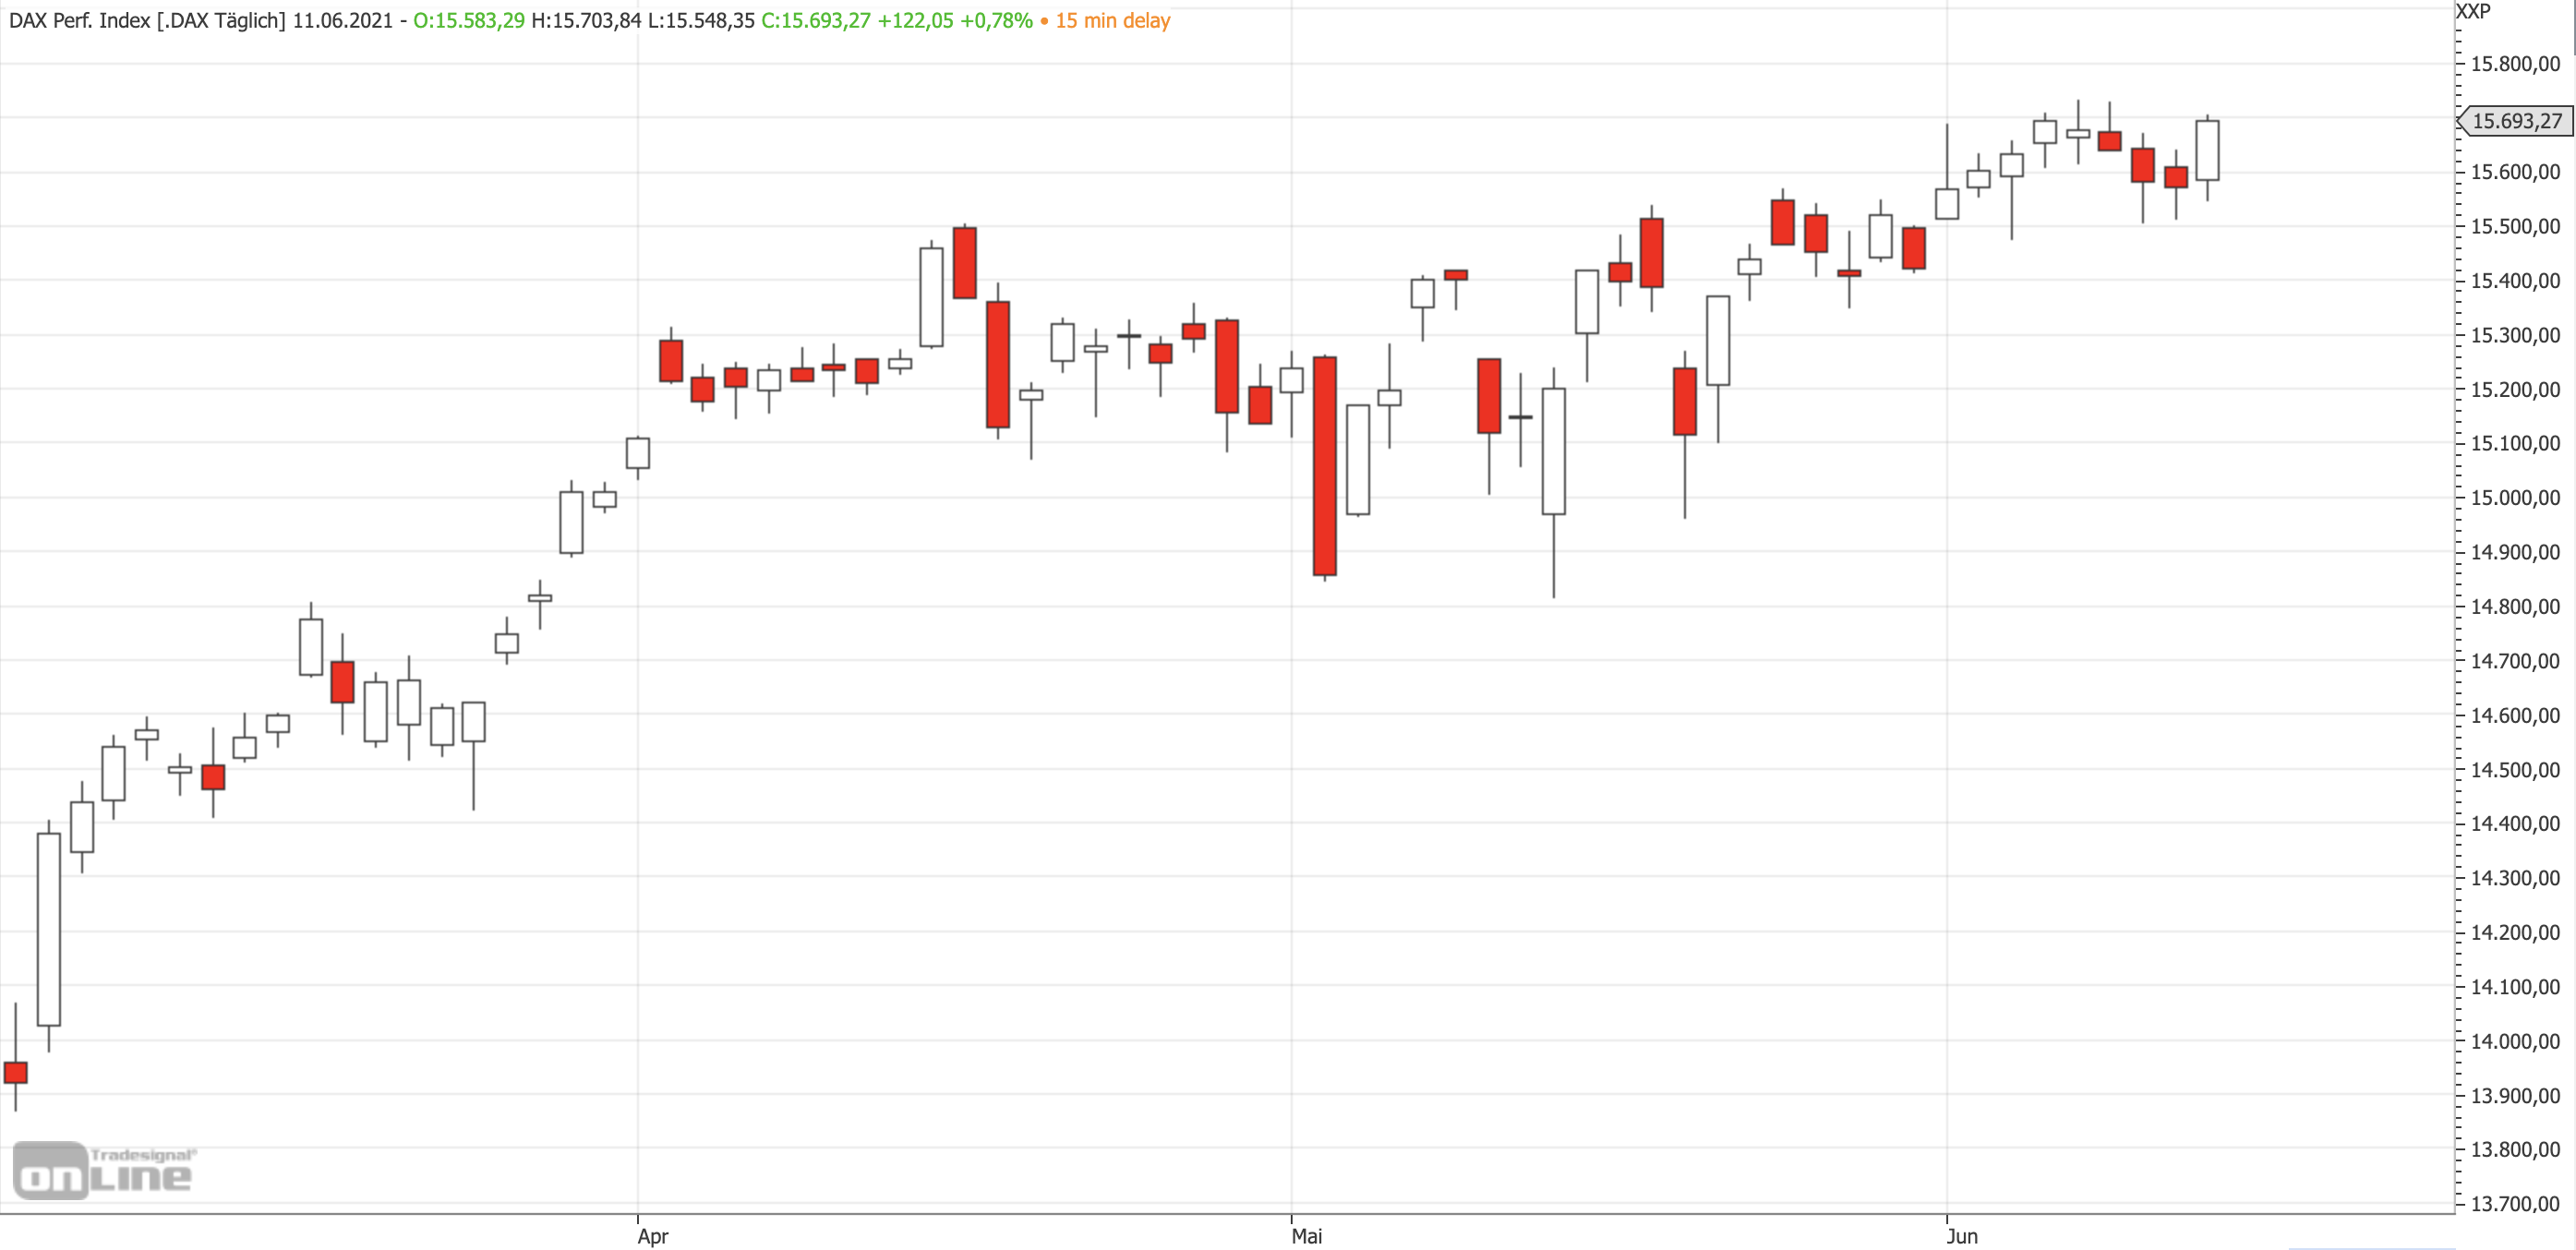 Mittelfristiger DAX-Chart am 11.06.2021